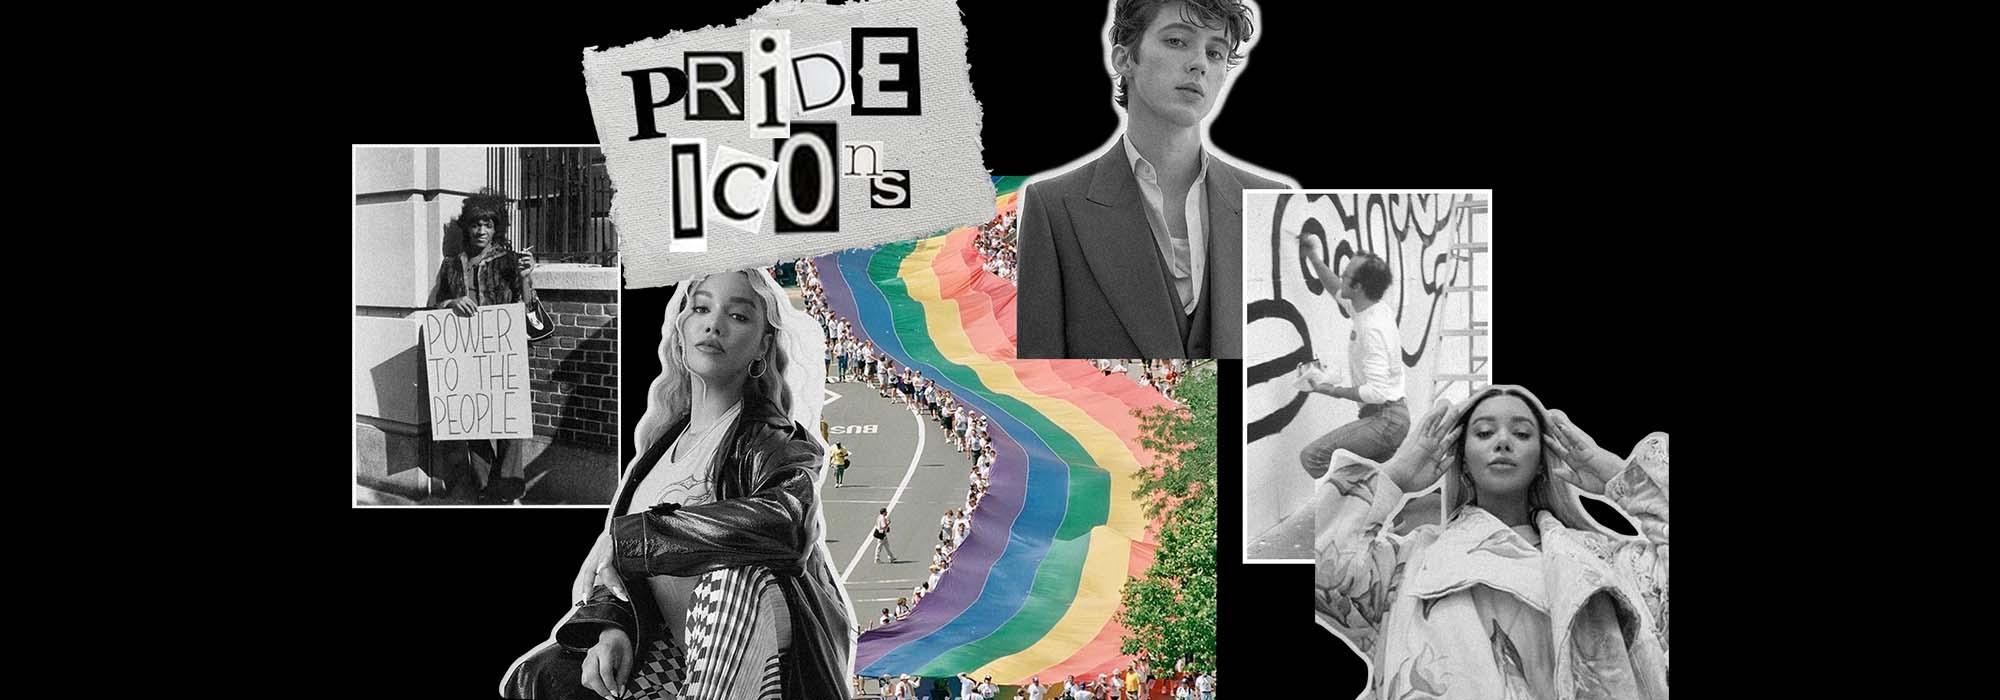 Pride icons